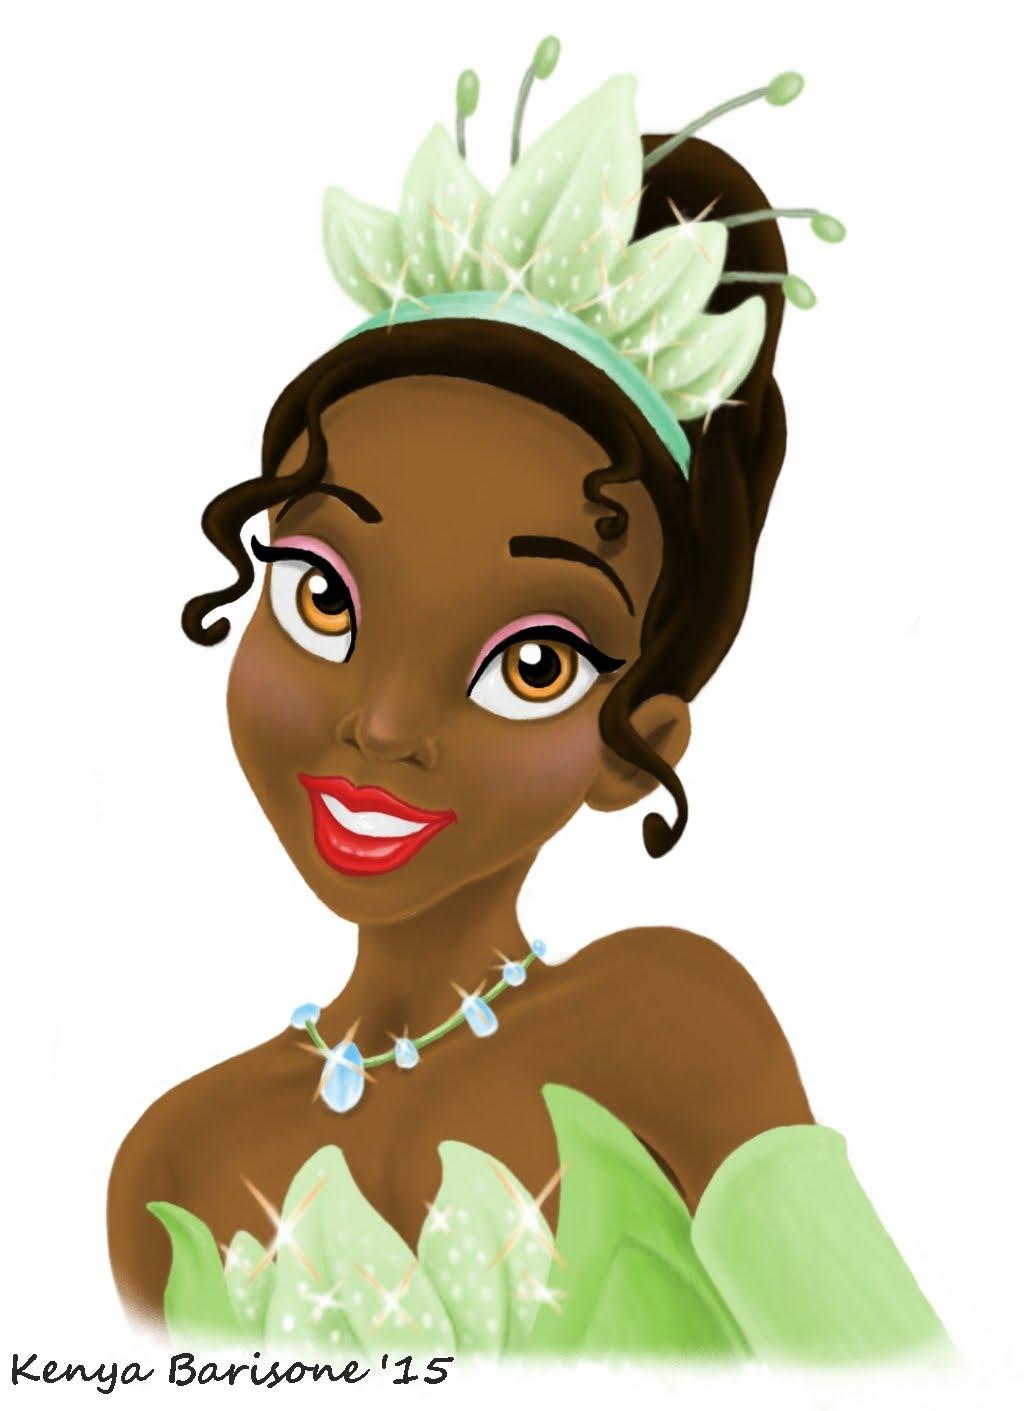 1035x1411 Disney's Princess And The Frog. Drawing Princess Tiana.